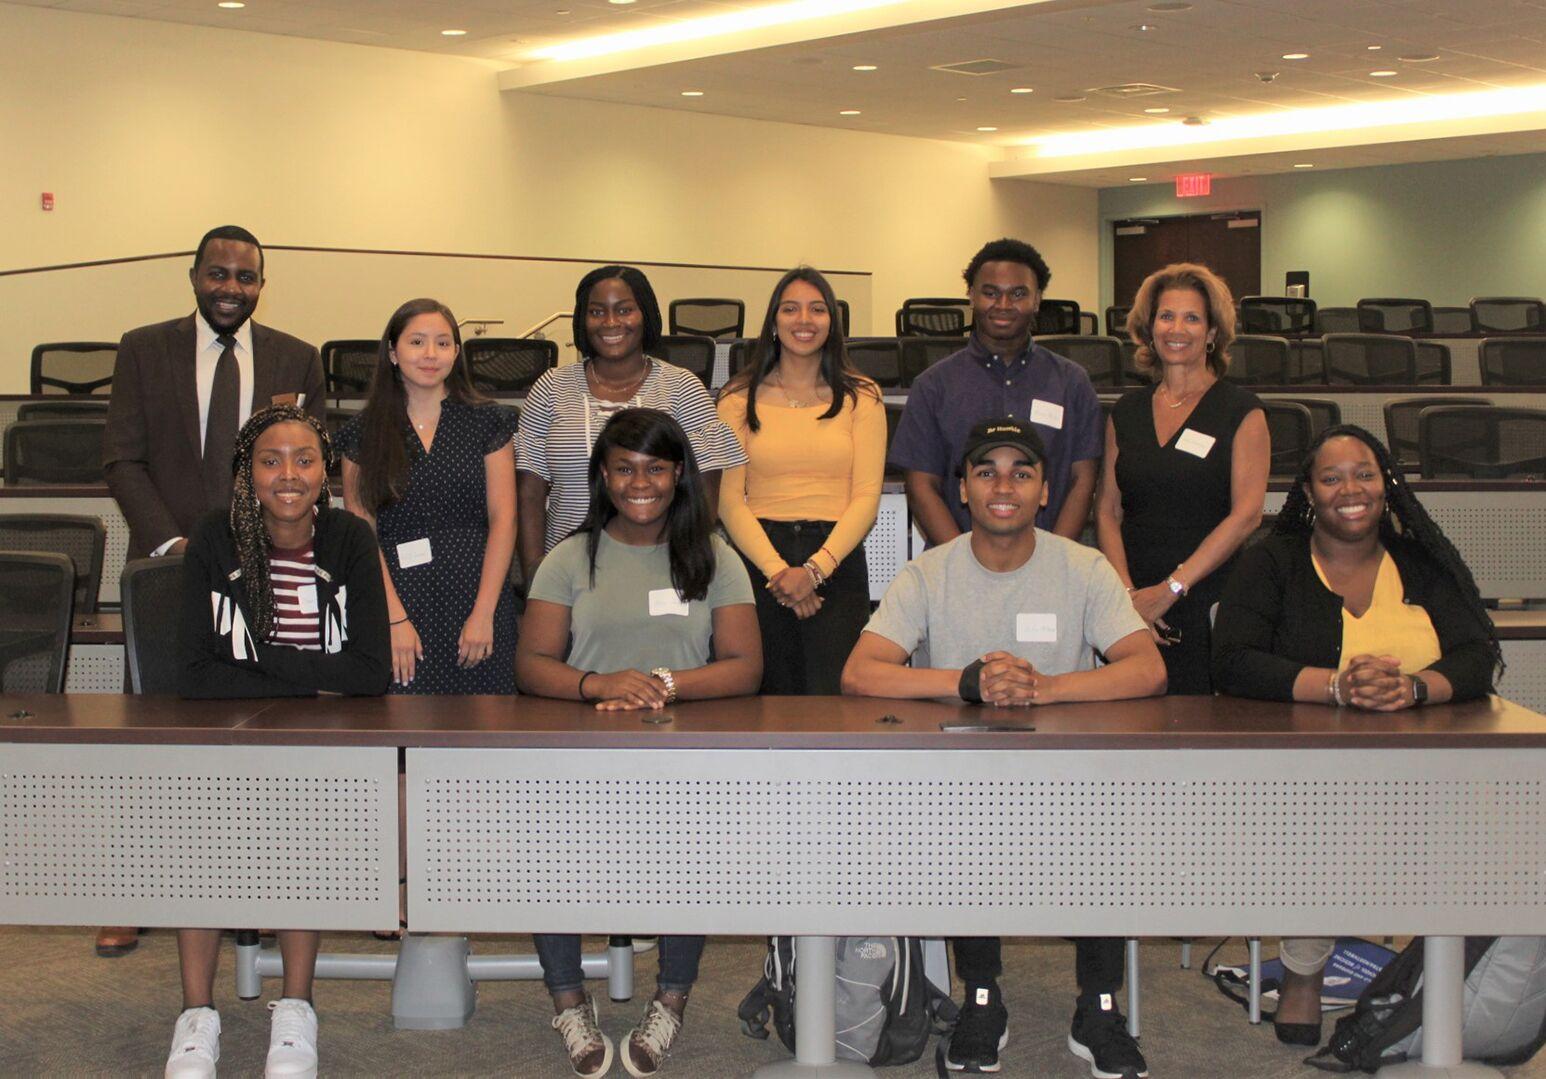 Back row, from left: Dr. Robert Roswell, associate dean of diversity and inclusion, Kelly Centeno, Tonge Enoh, Giselle Molina, Arthur Registre, Gina Granger, program director. Front, from left: Ijeoma Nnadi, Alea Jones, Julian McDonald, Lindsey Johnson.